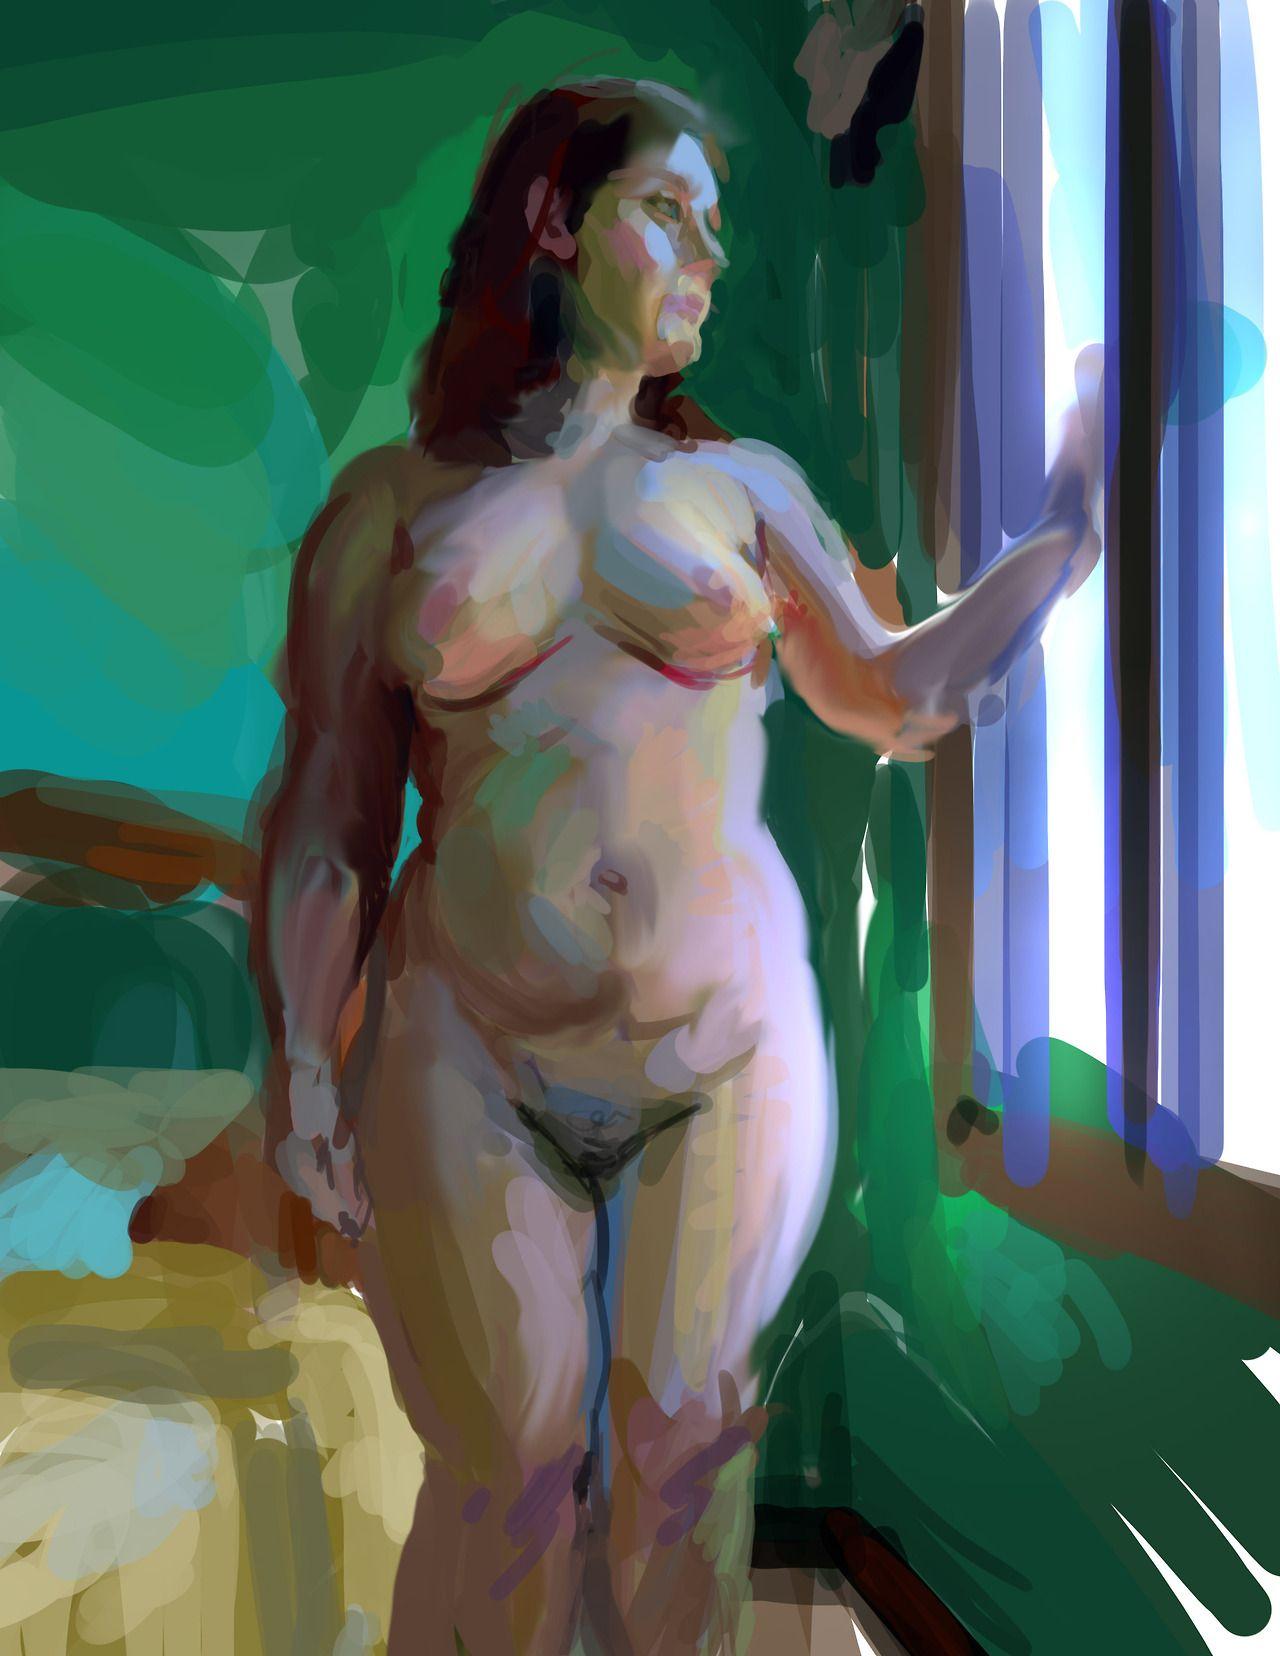 Carol Ann Duffy Standing Female Nude 28